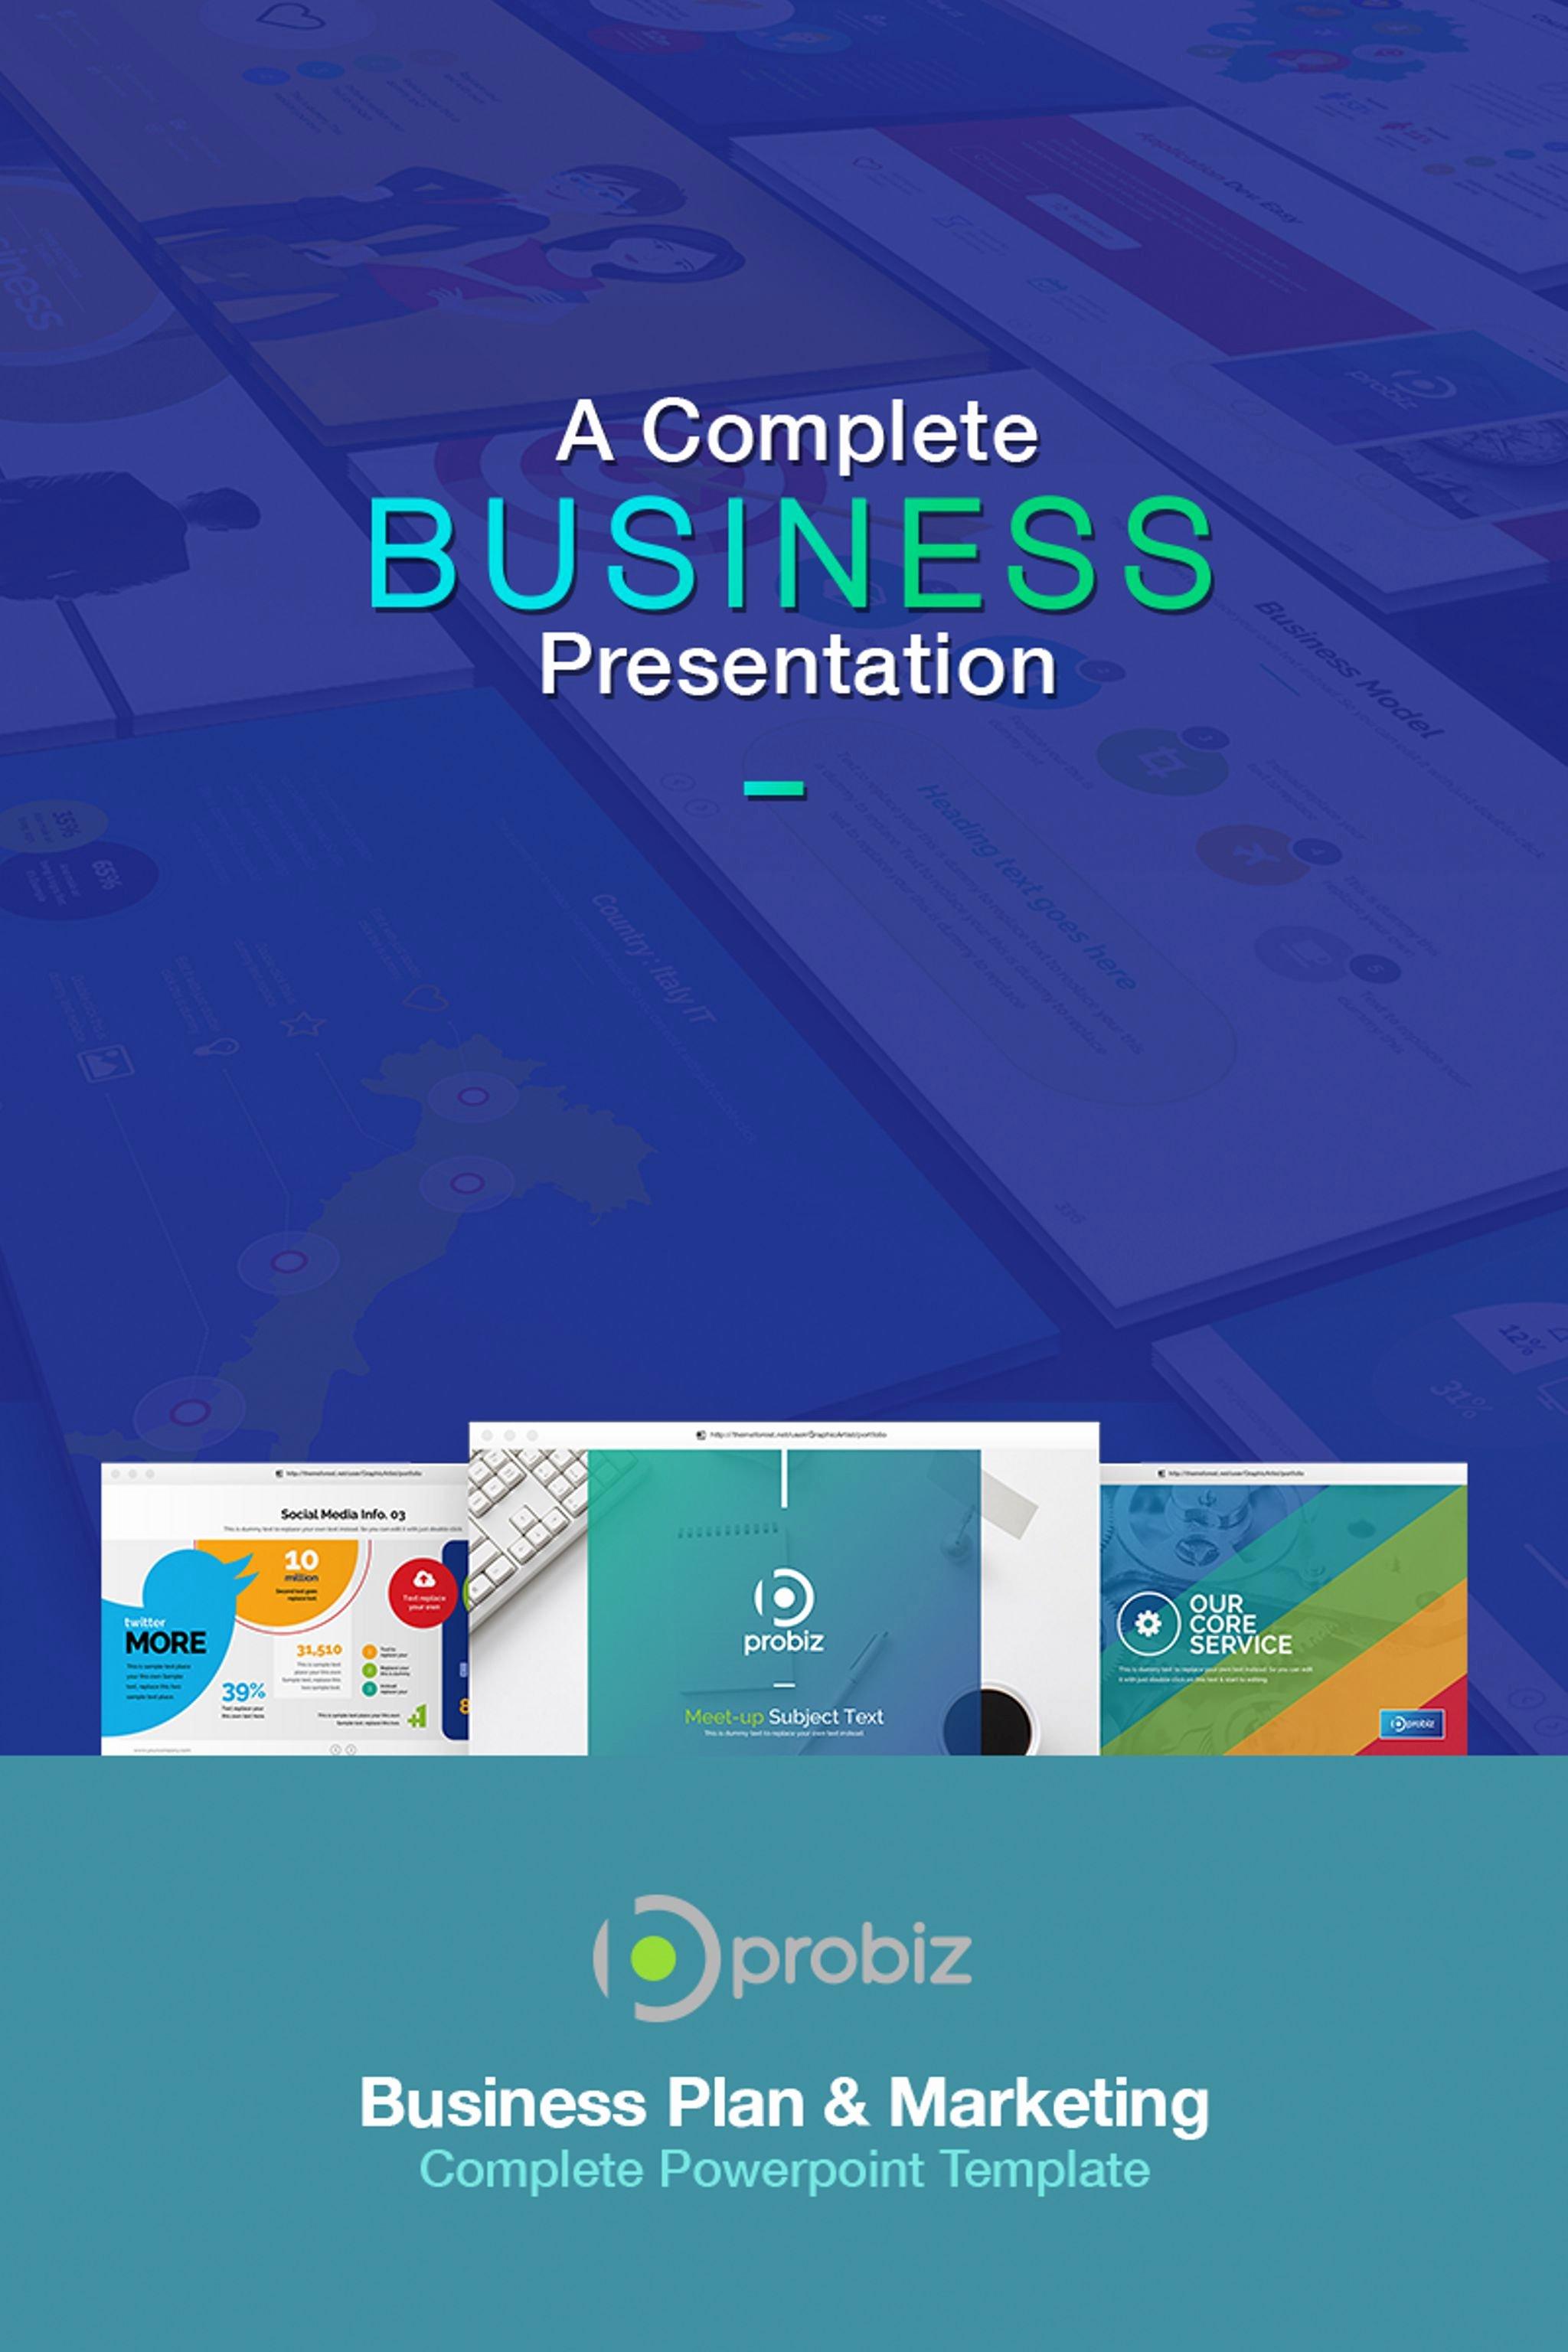 Business Plan Powerpoint Template Elegant Business Plan & Marketing Powerpoint Template